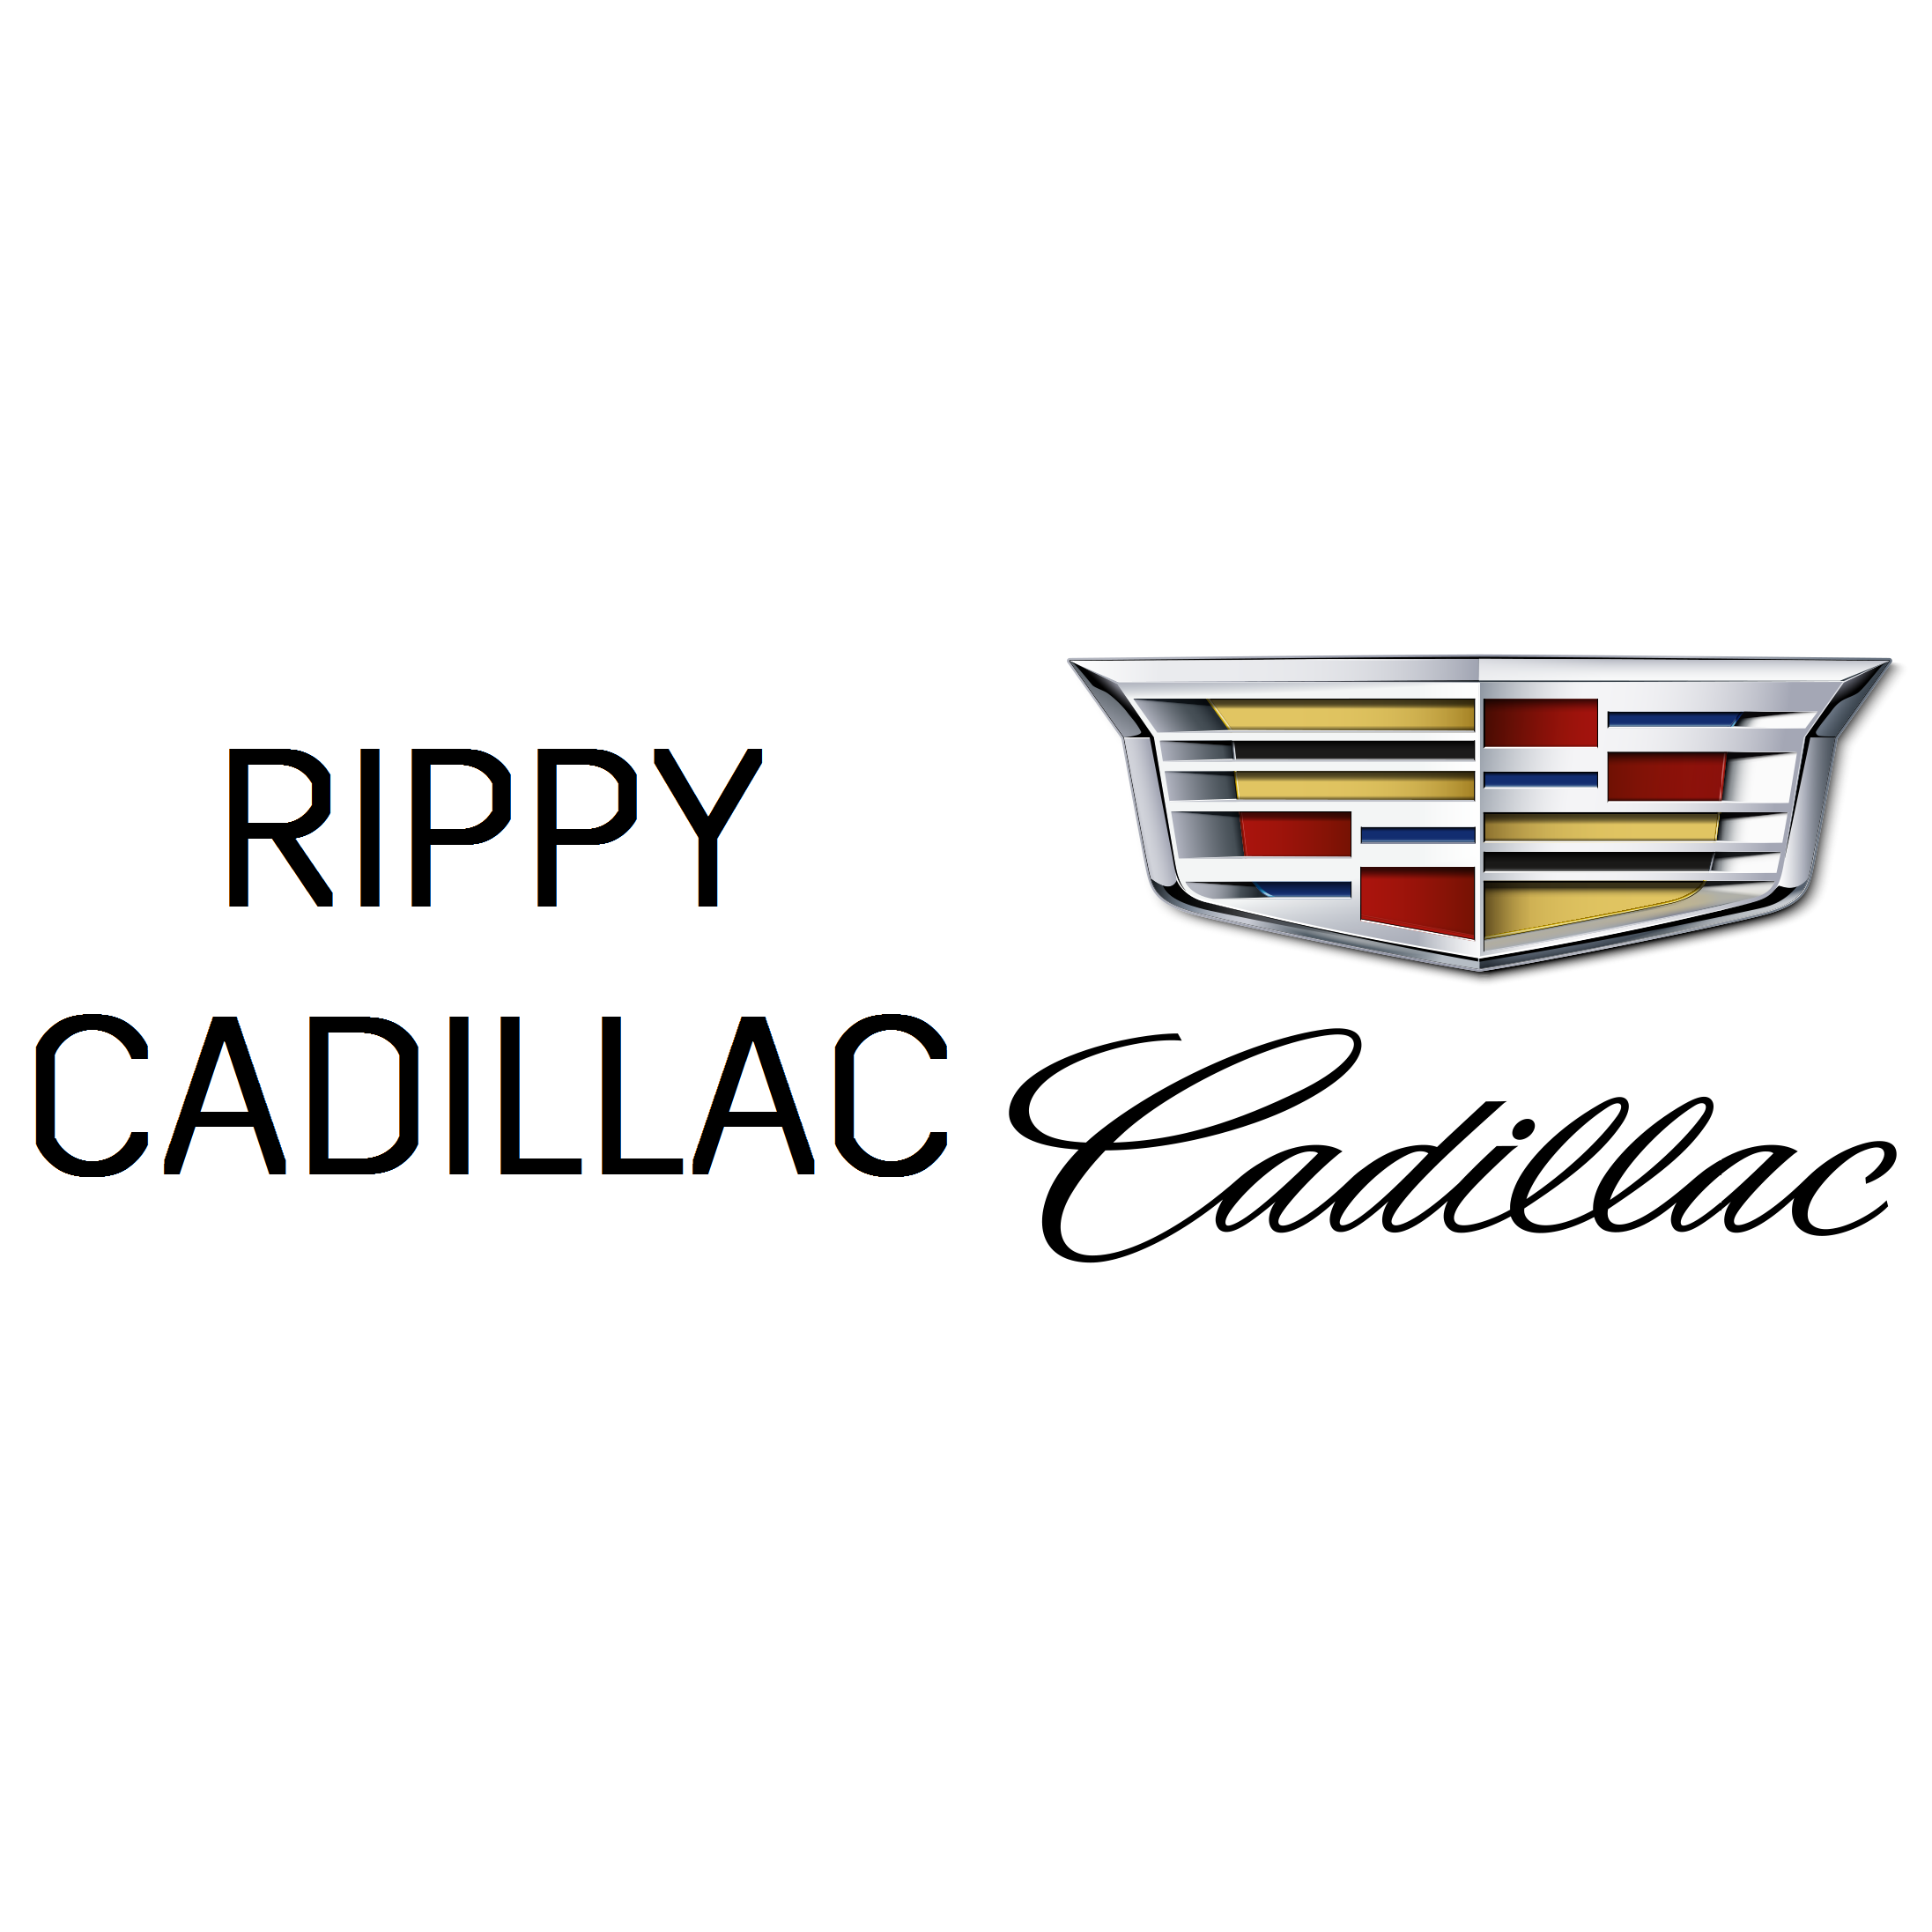 Rippy Cadillac